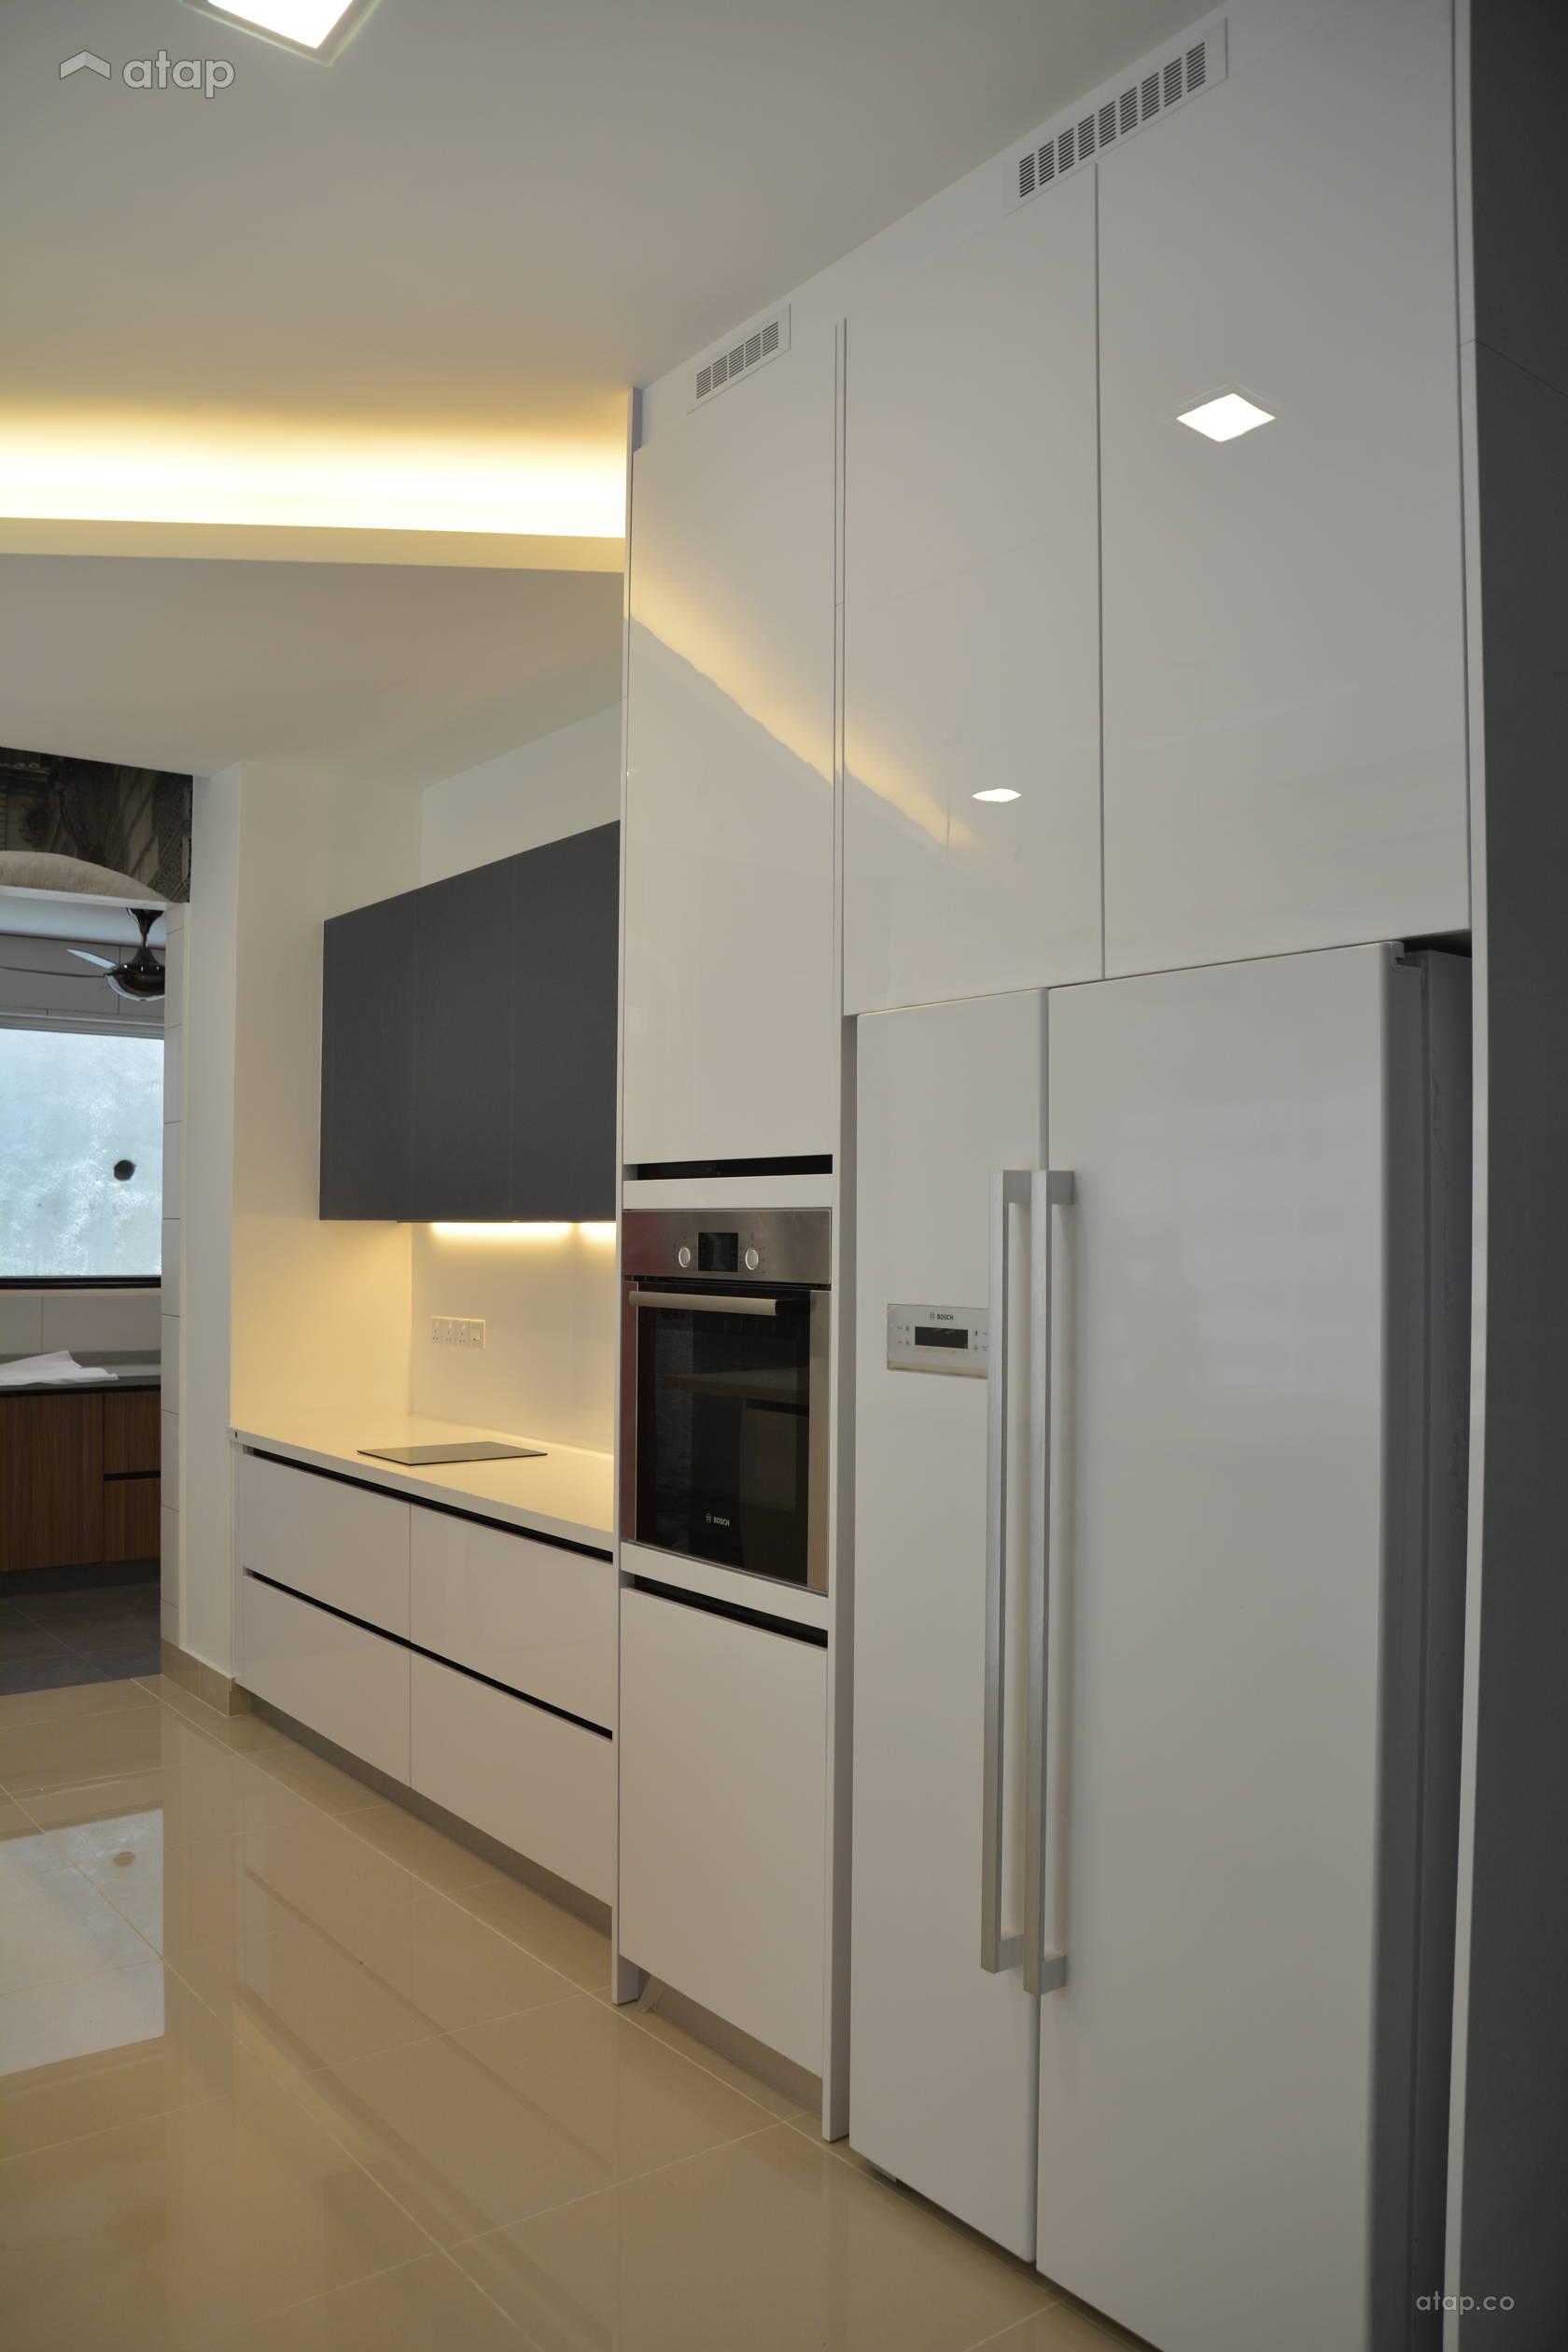 kitchen cabinet interior design renovation ideas, photos and price